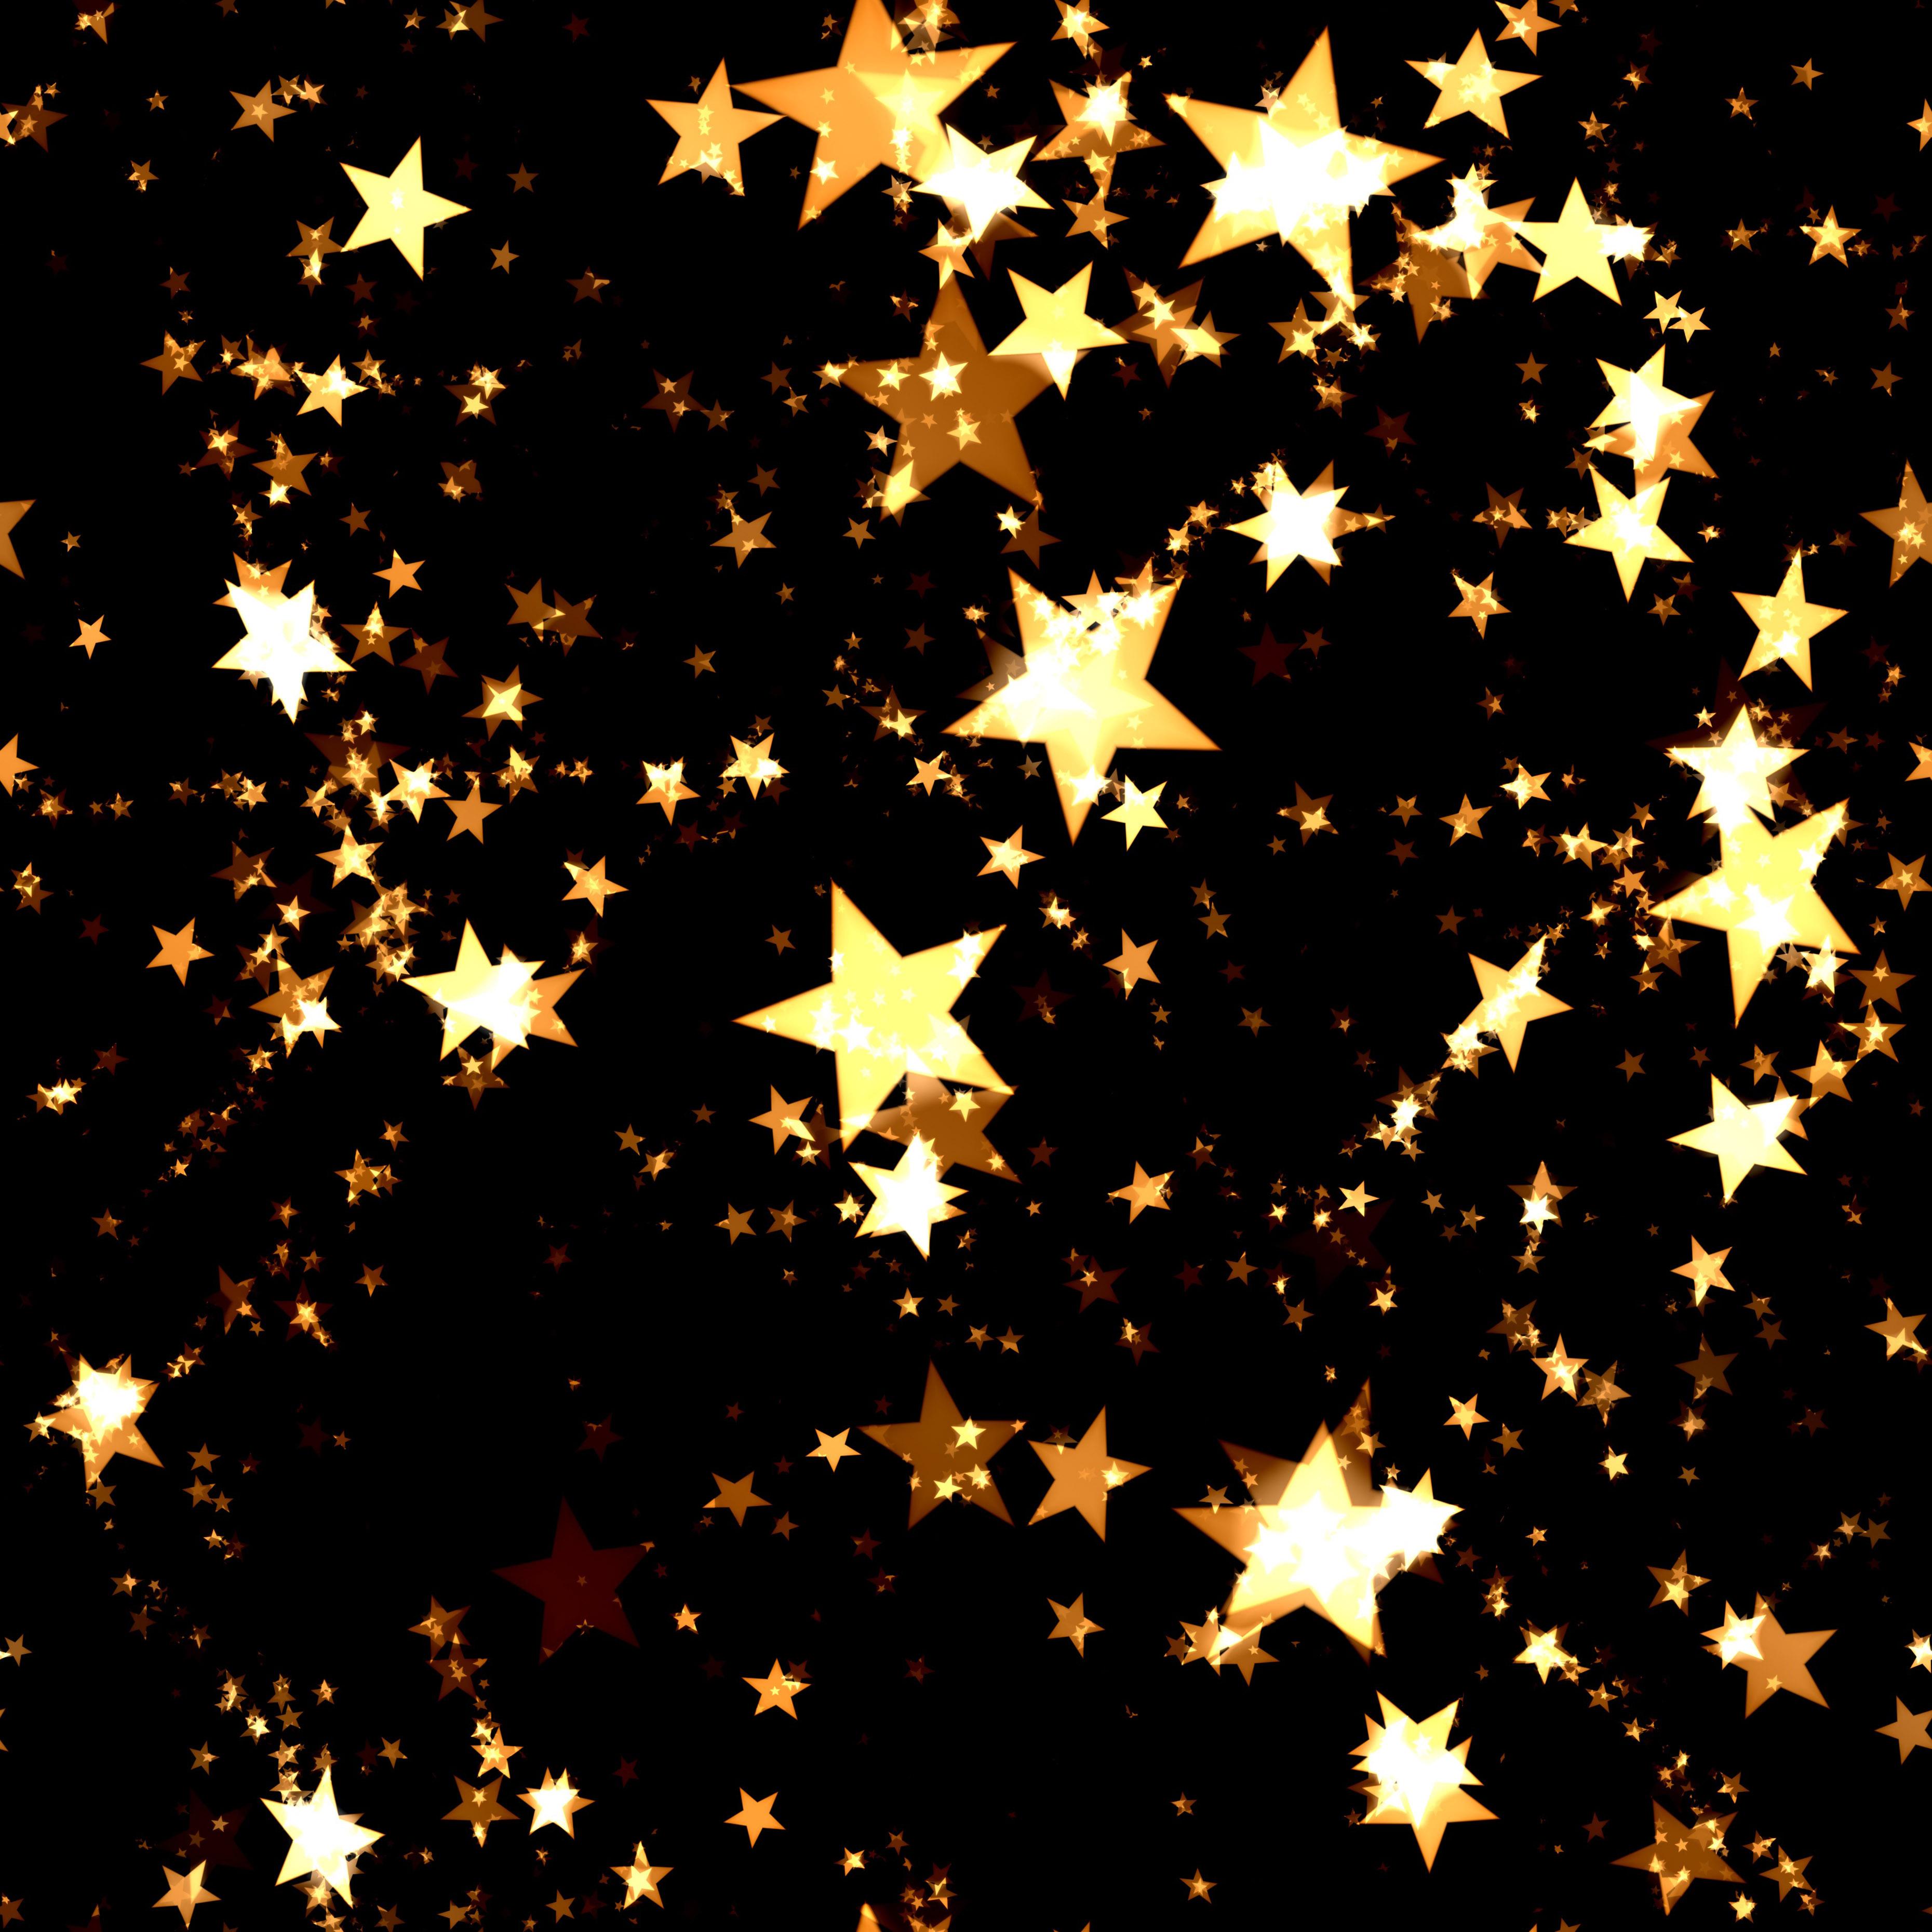 bright gold stars background image wwwmyfreetextures